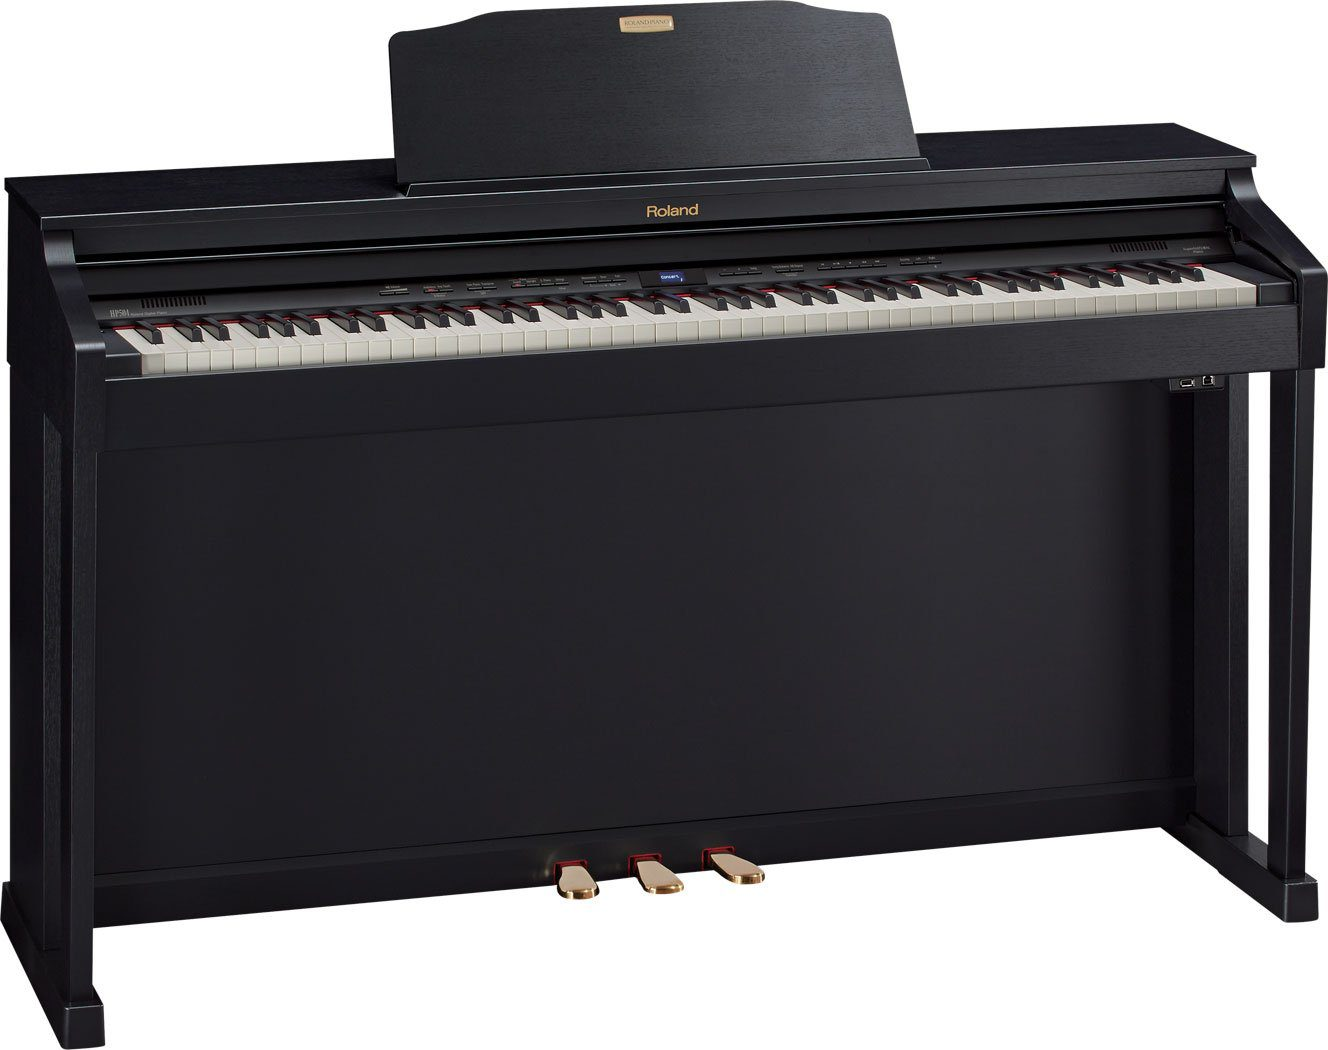 vergleichstest digitalpianos mittelklasse kawai cn34 roland hp 504 yamaha clp 525. Black Bedroom Furniture Sets. Home Design Ideas